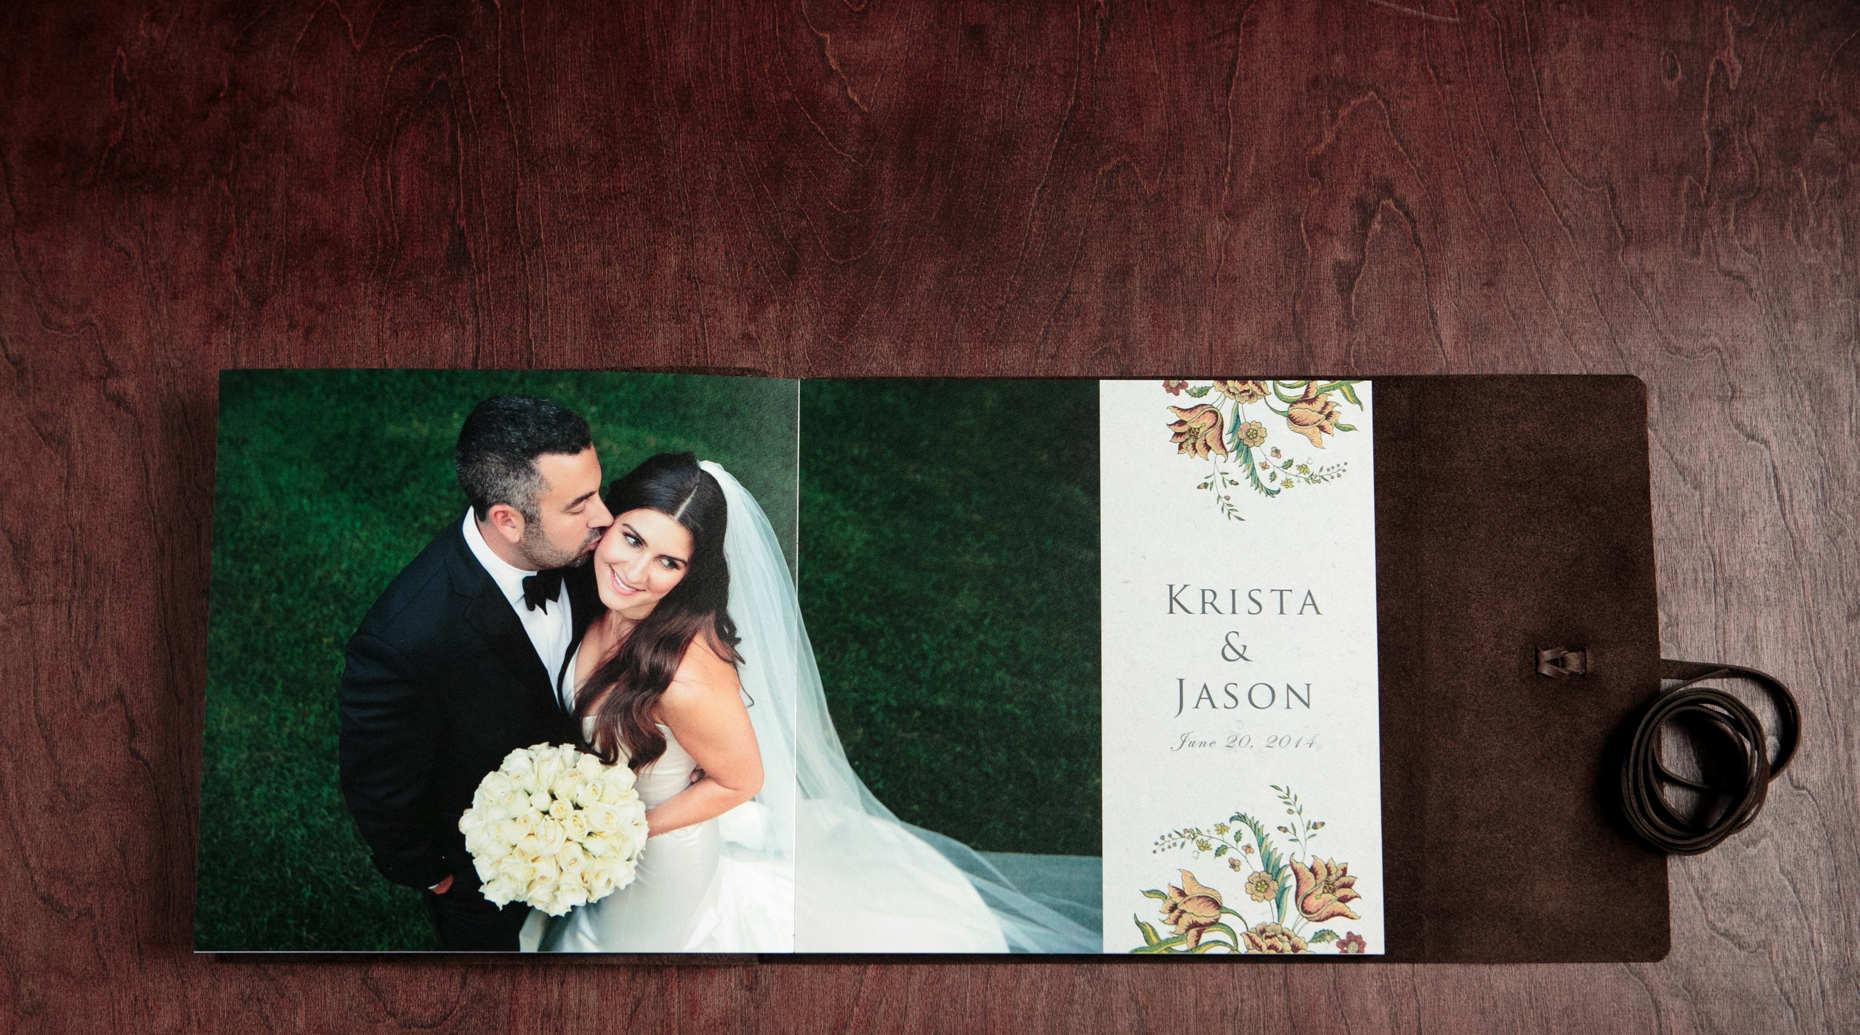 Krista tyson wedding